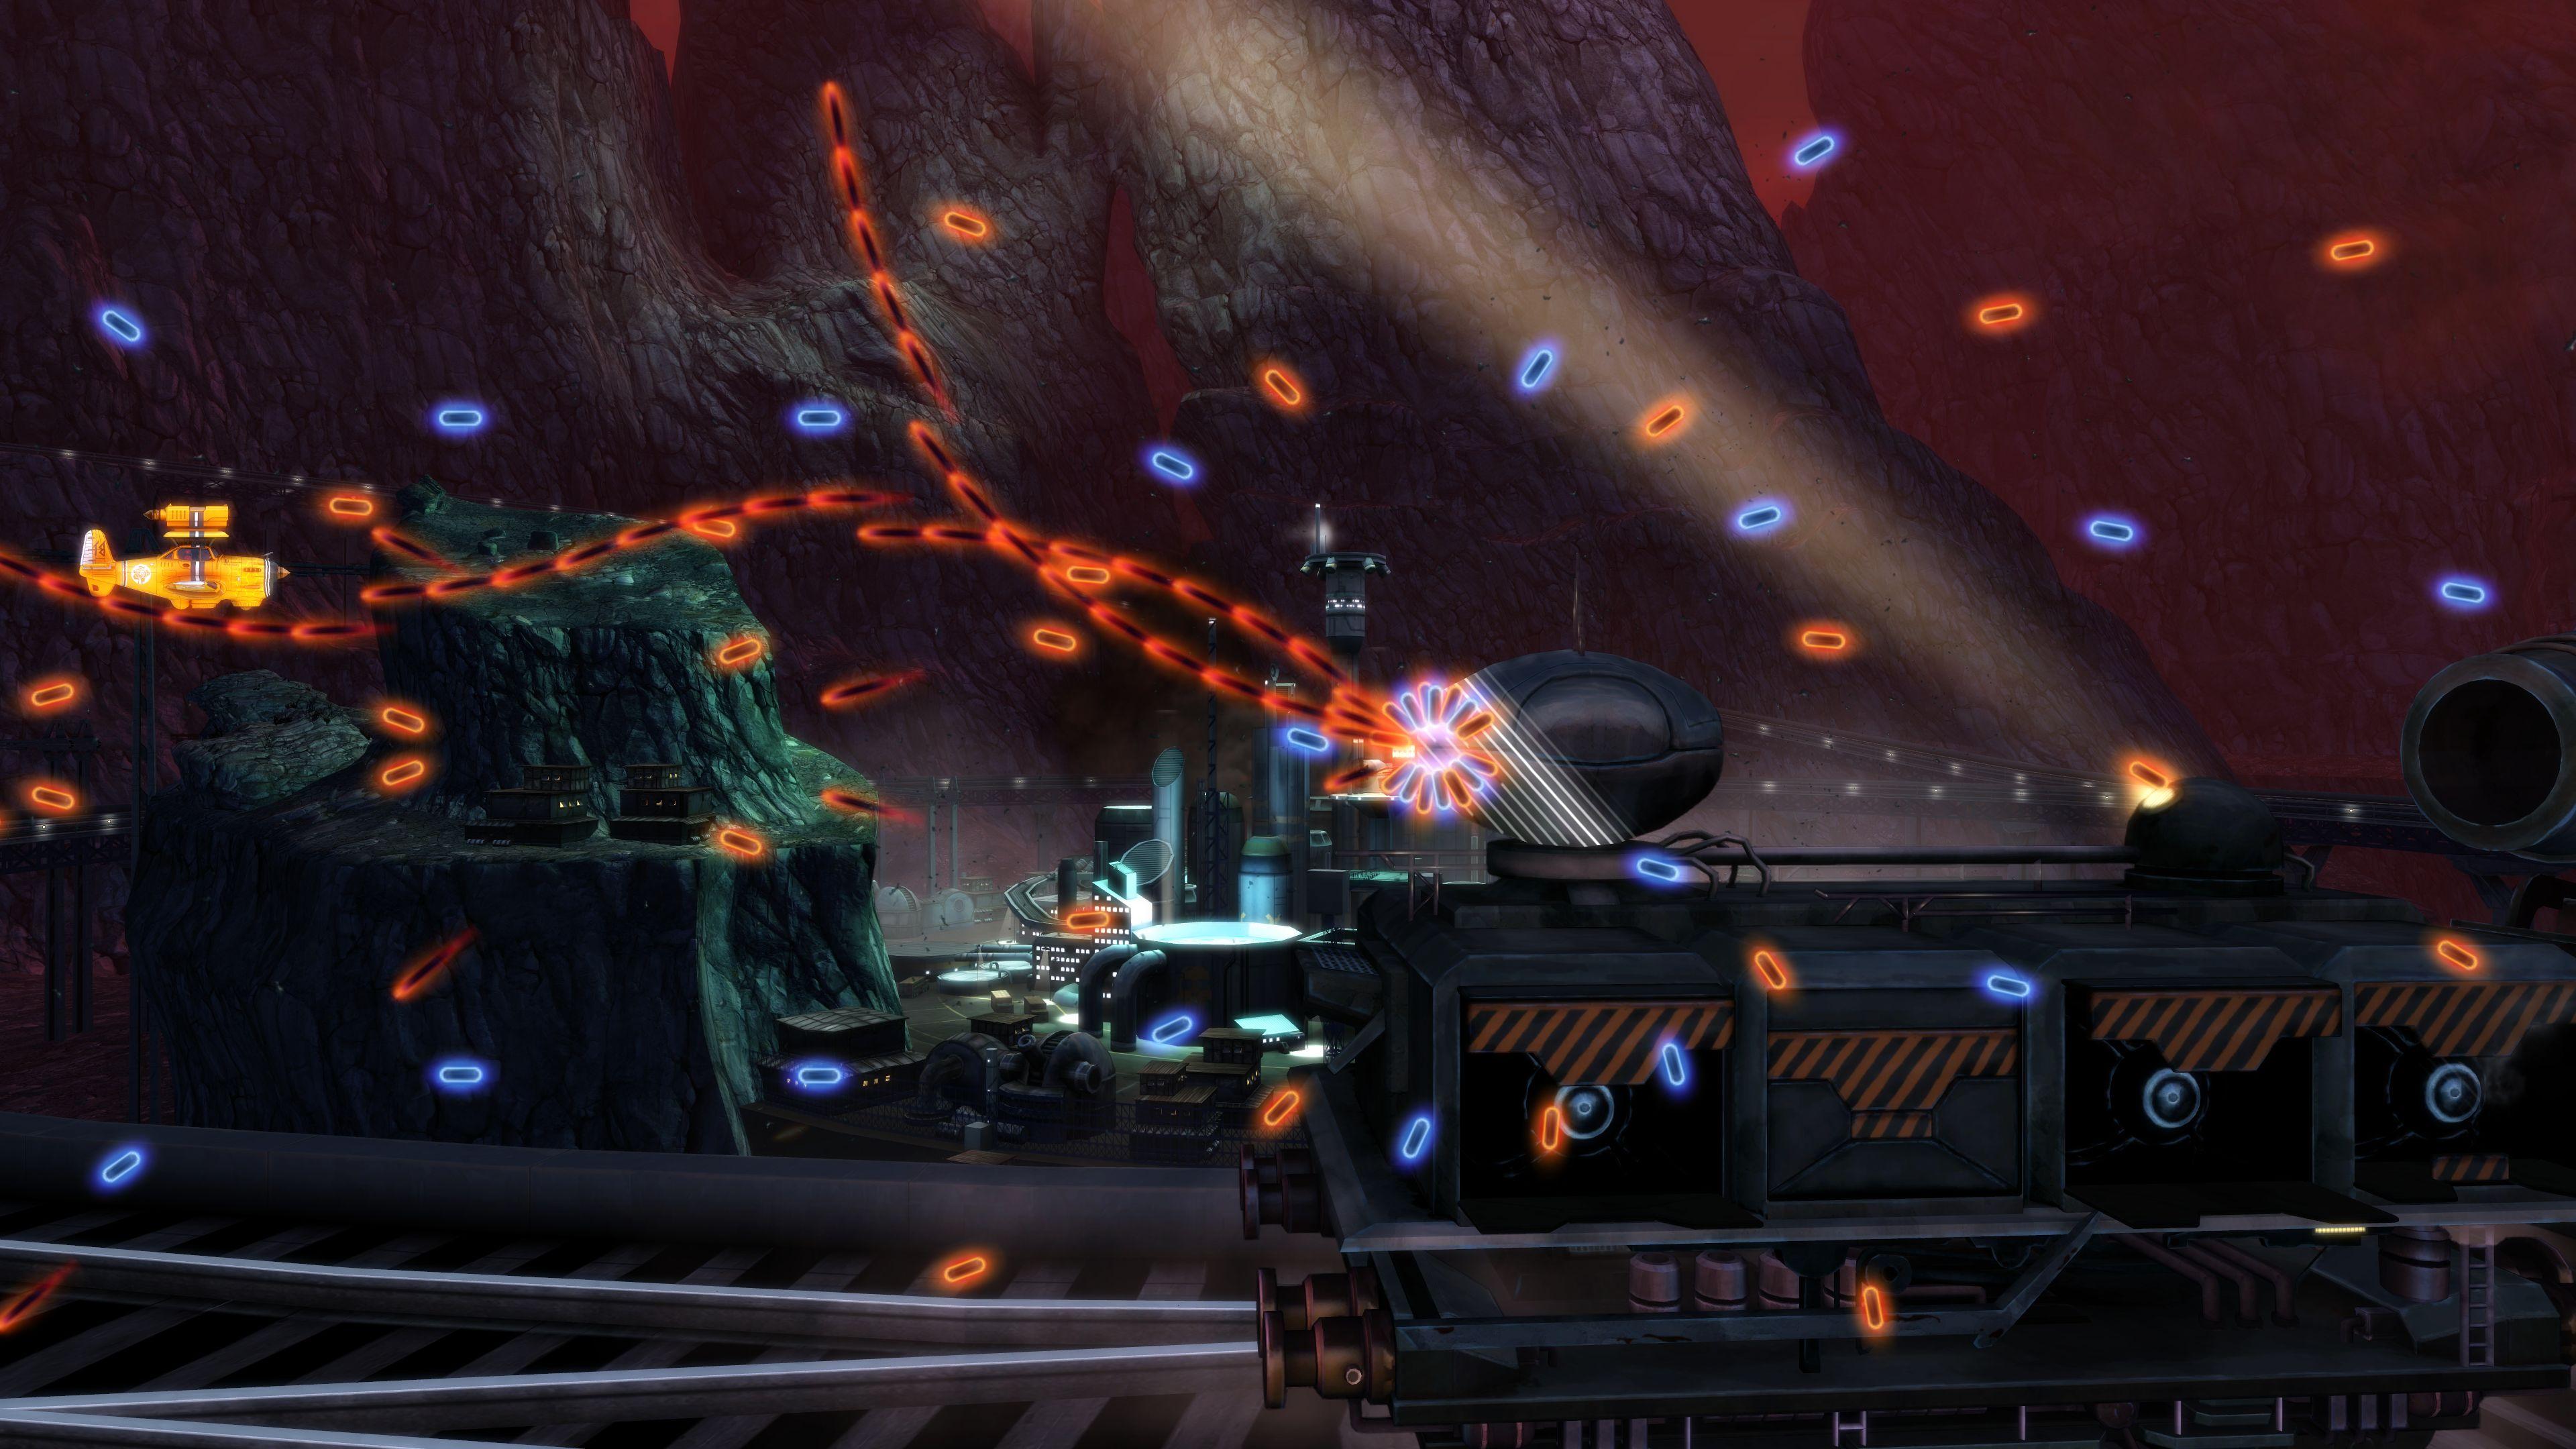 Hry pro Switch se rozrostou o Battle Chasers: Nightwar a Sine Mora EX 142161